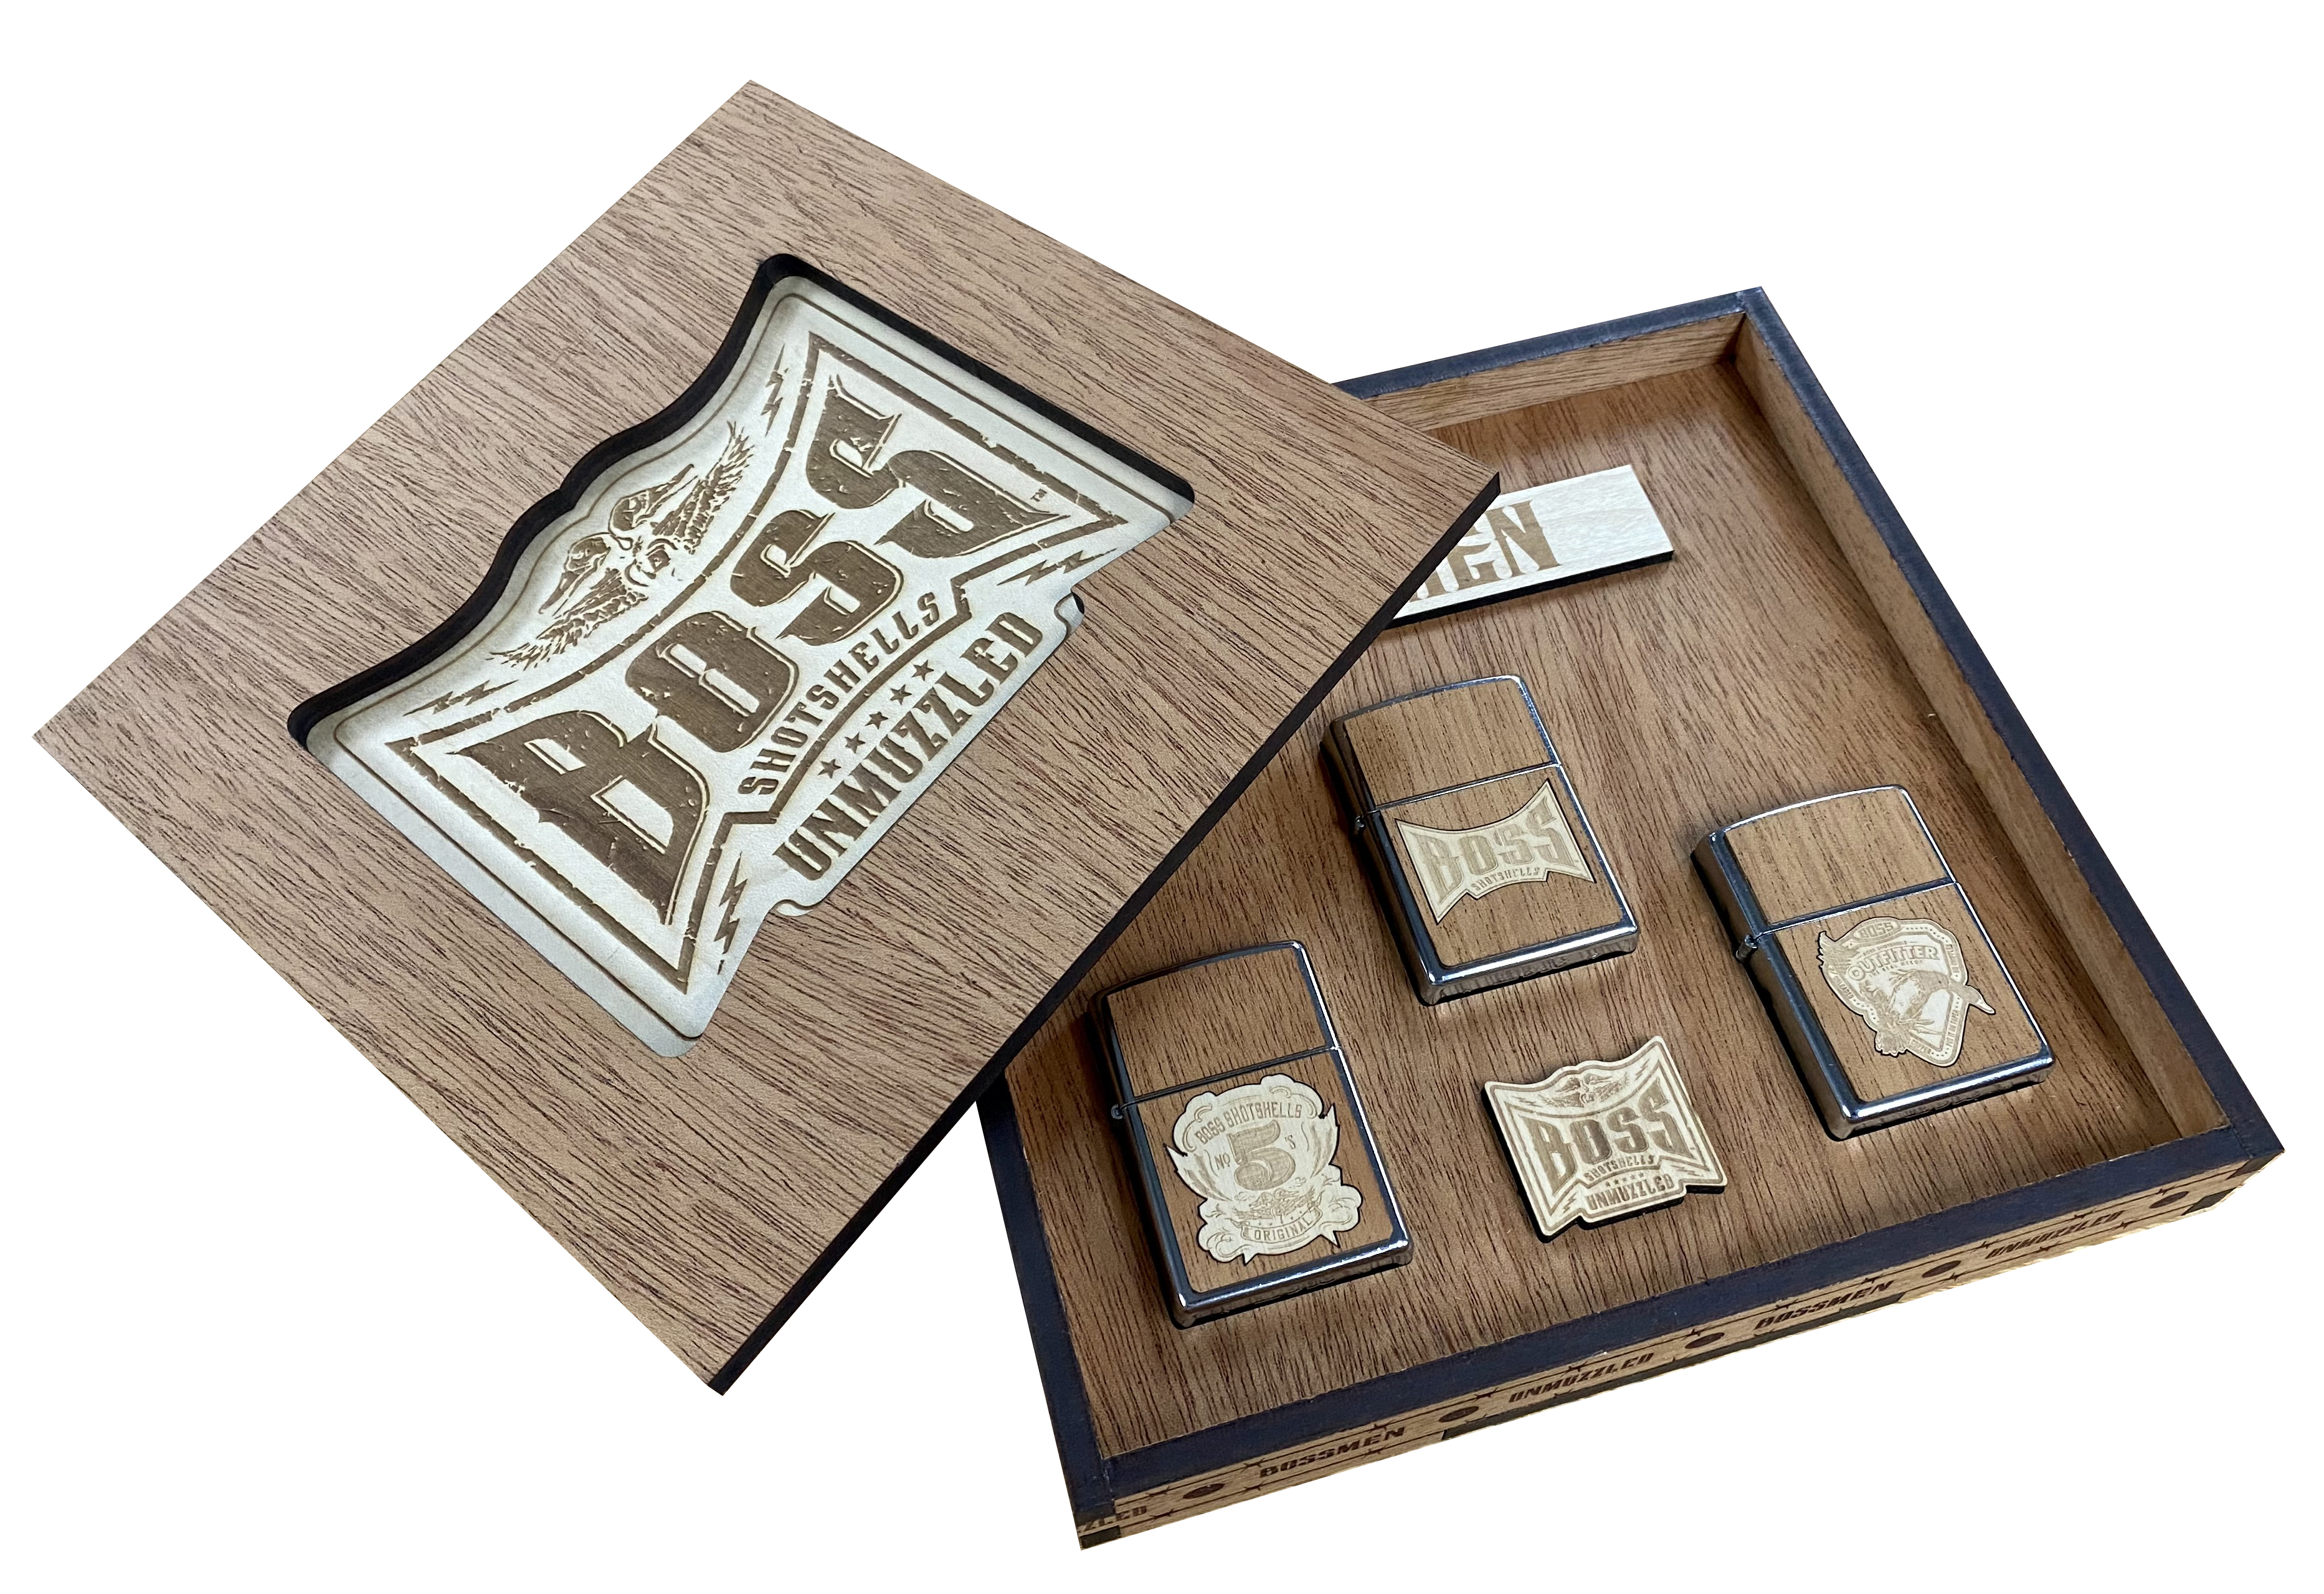 Boss Ammo Display Box in Walnut (Lighters) copy